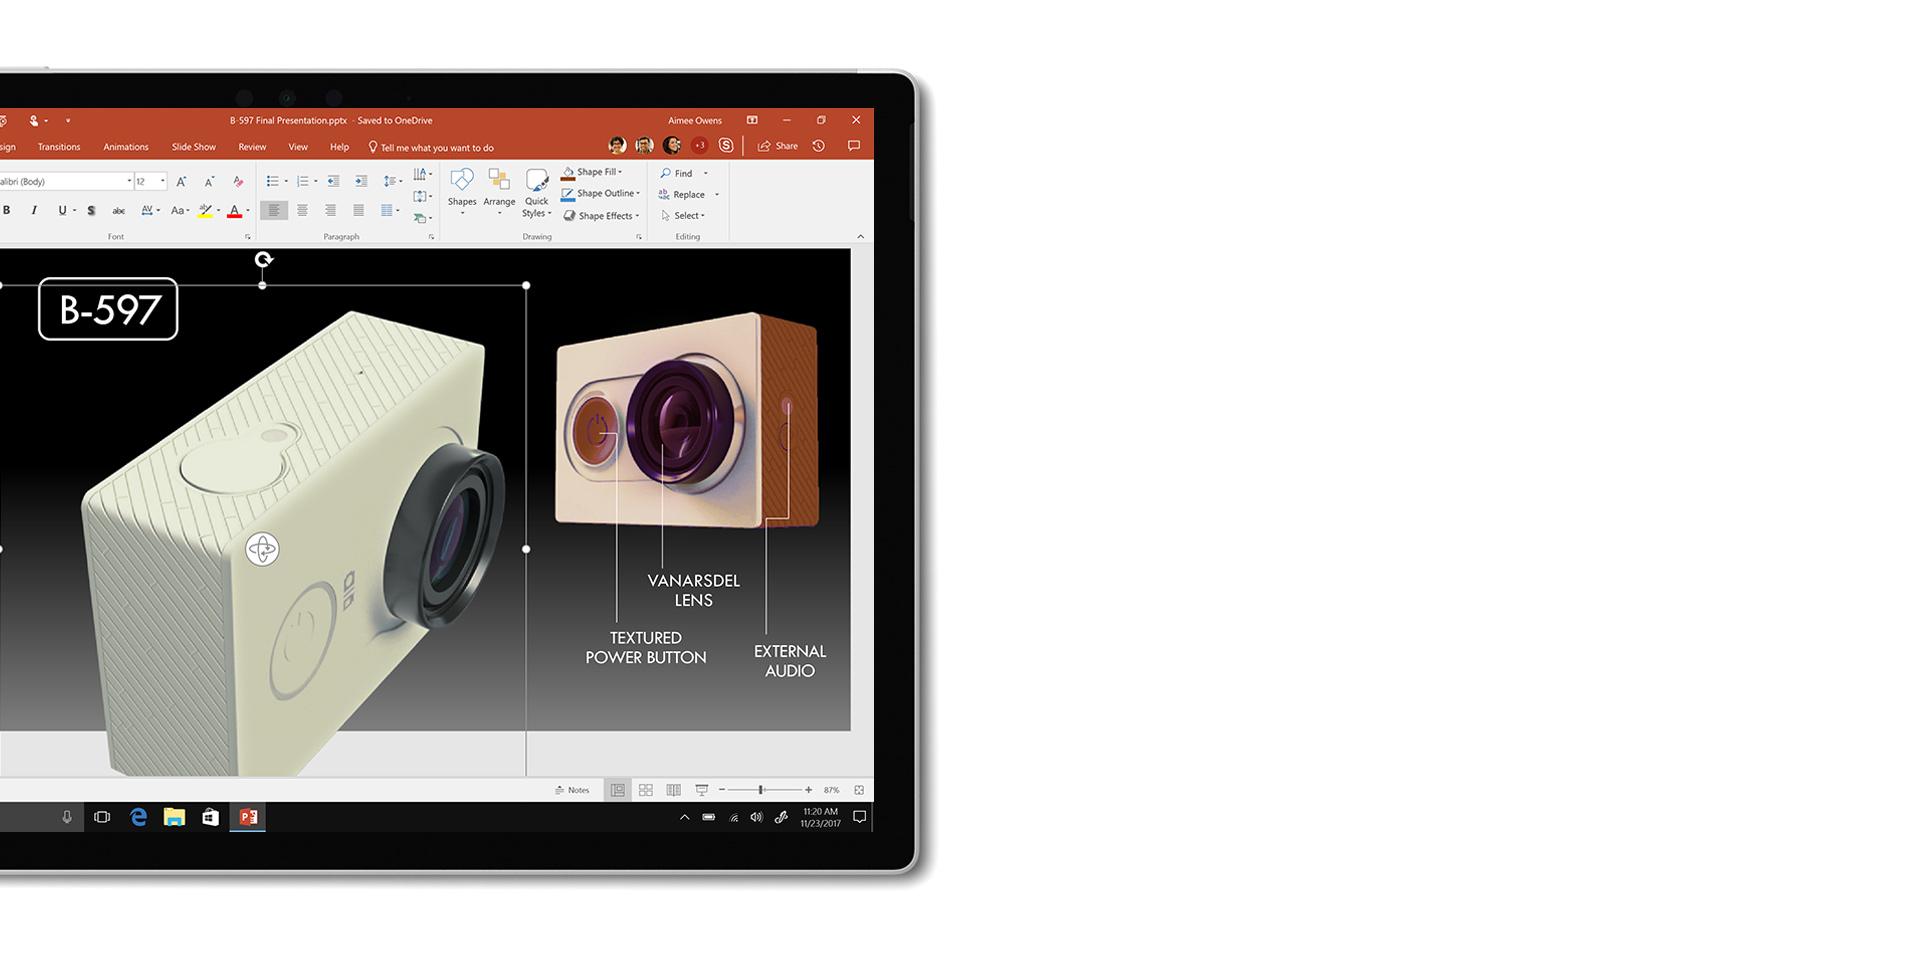 PowerPoint 應用程式顯示在已從鍵盤拆下的 Surface Book 2 螢幕上。